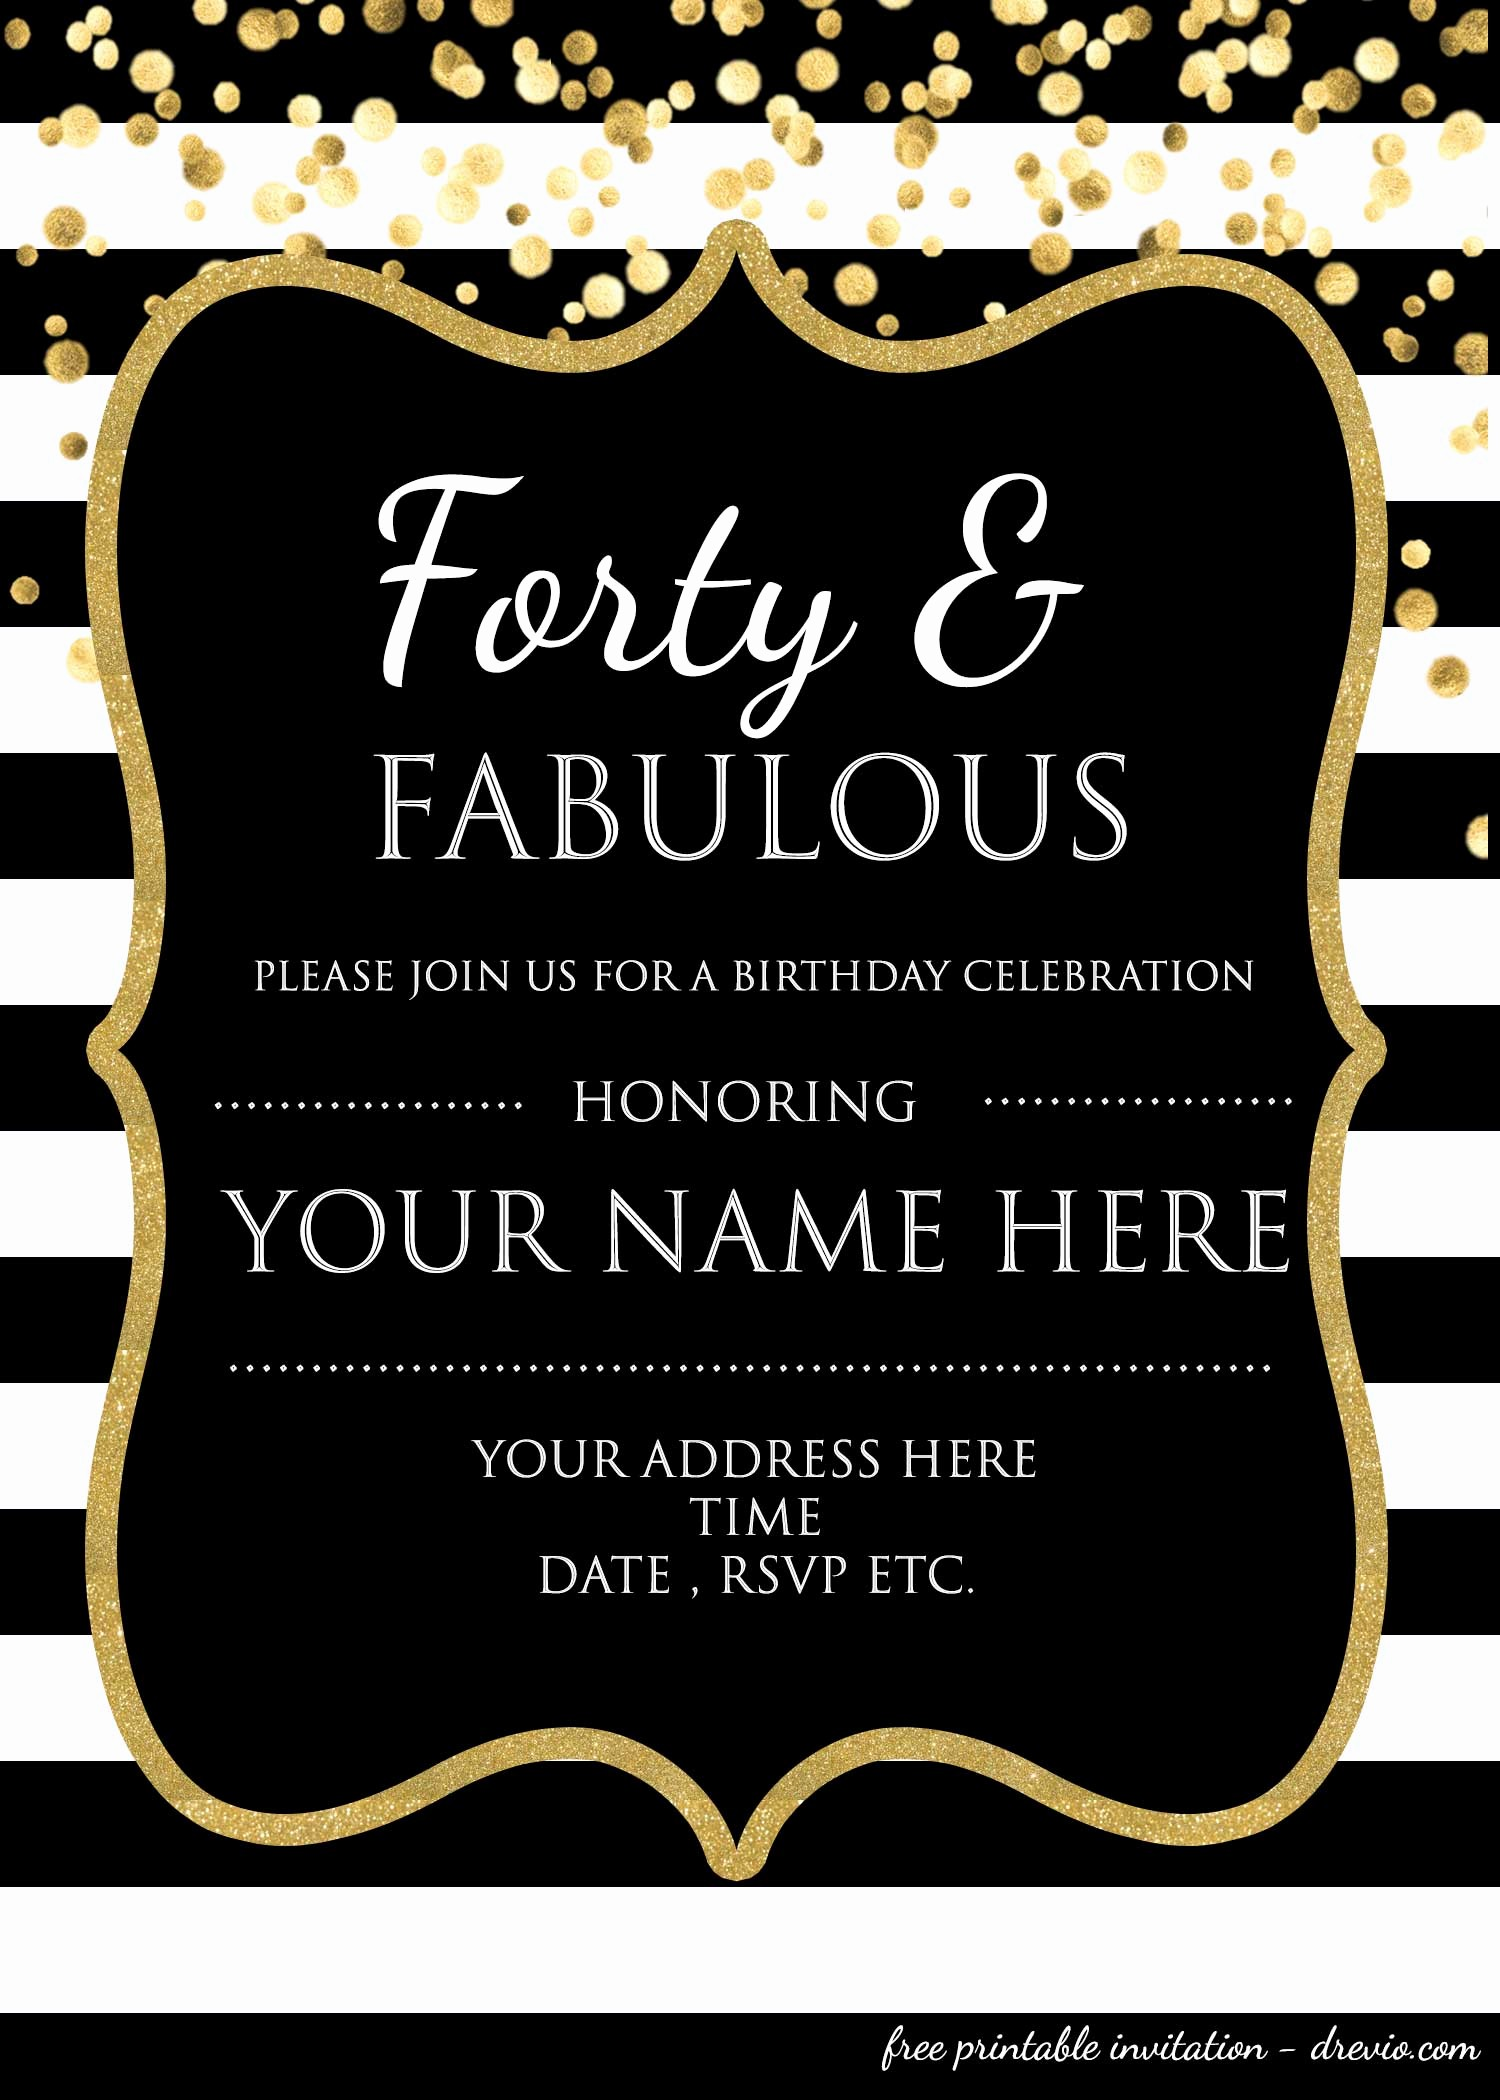 Free 40th Birthday Invitations Templates Beautiful forty & Fabulous 40th Birthday Invitation Template – Psd